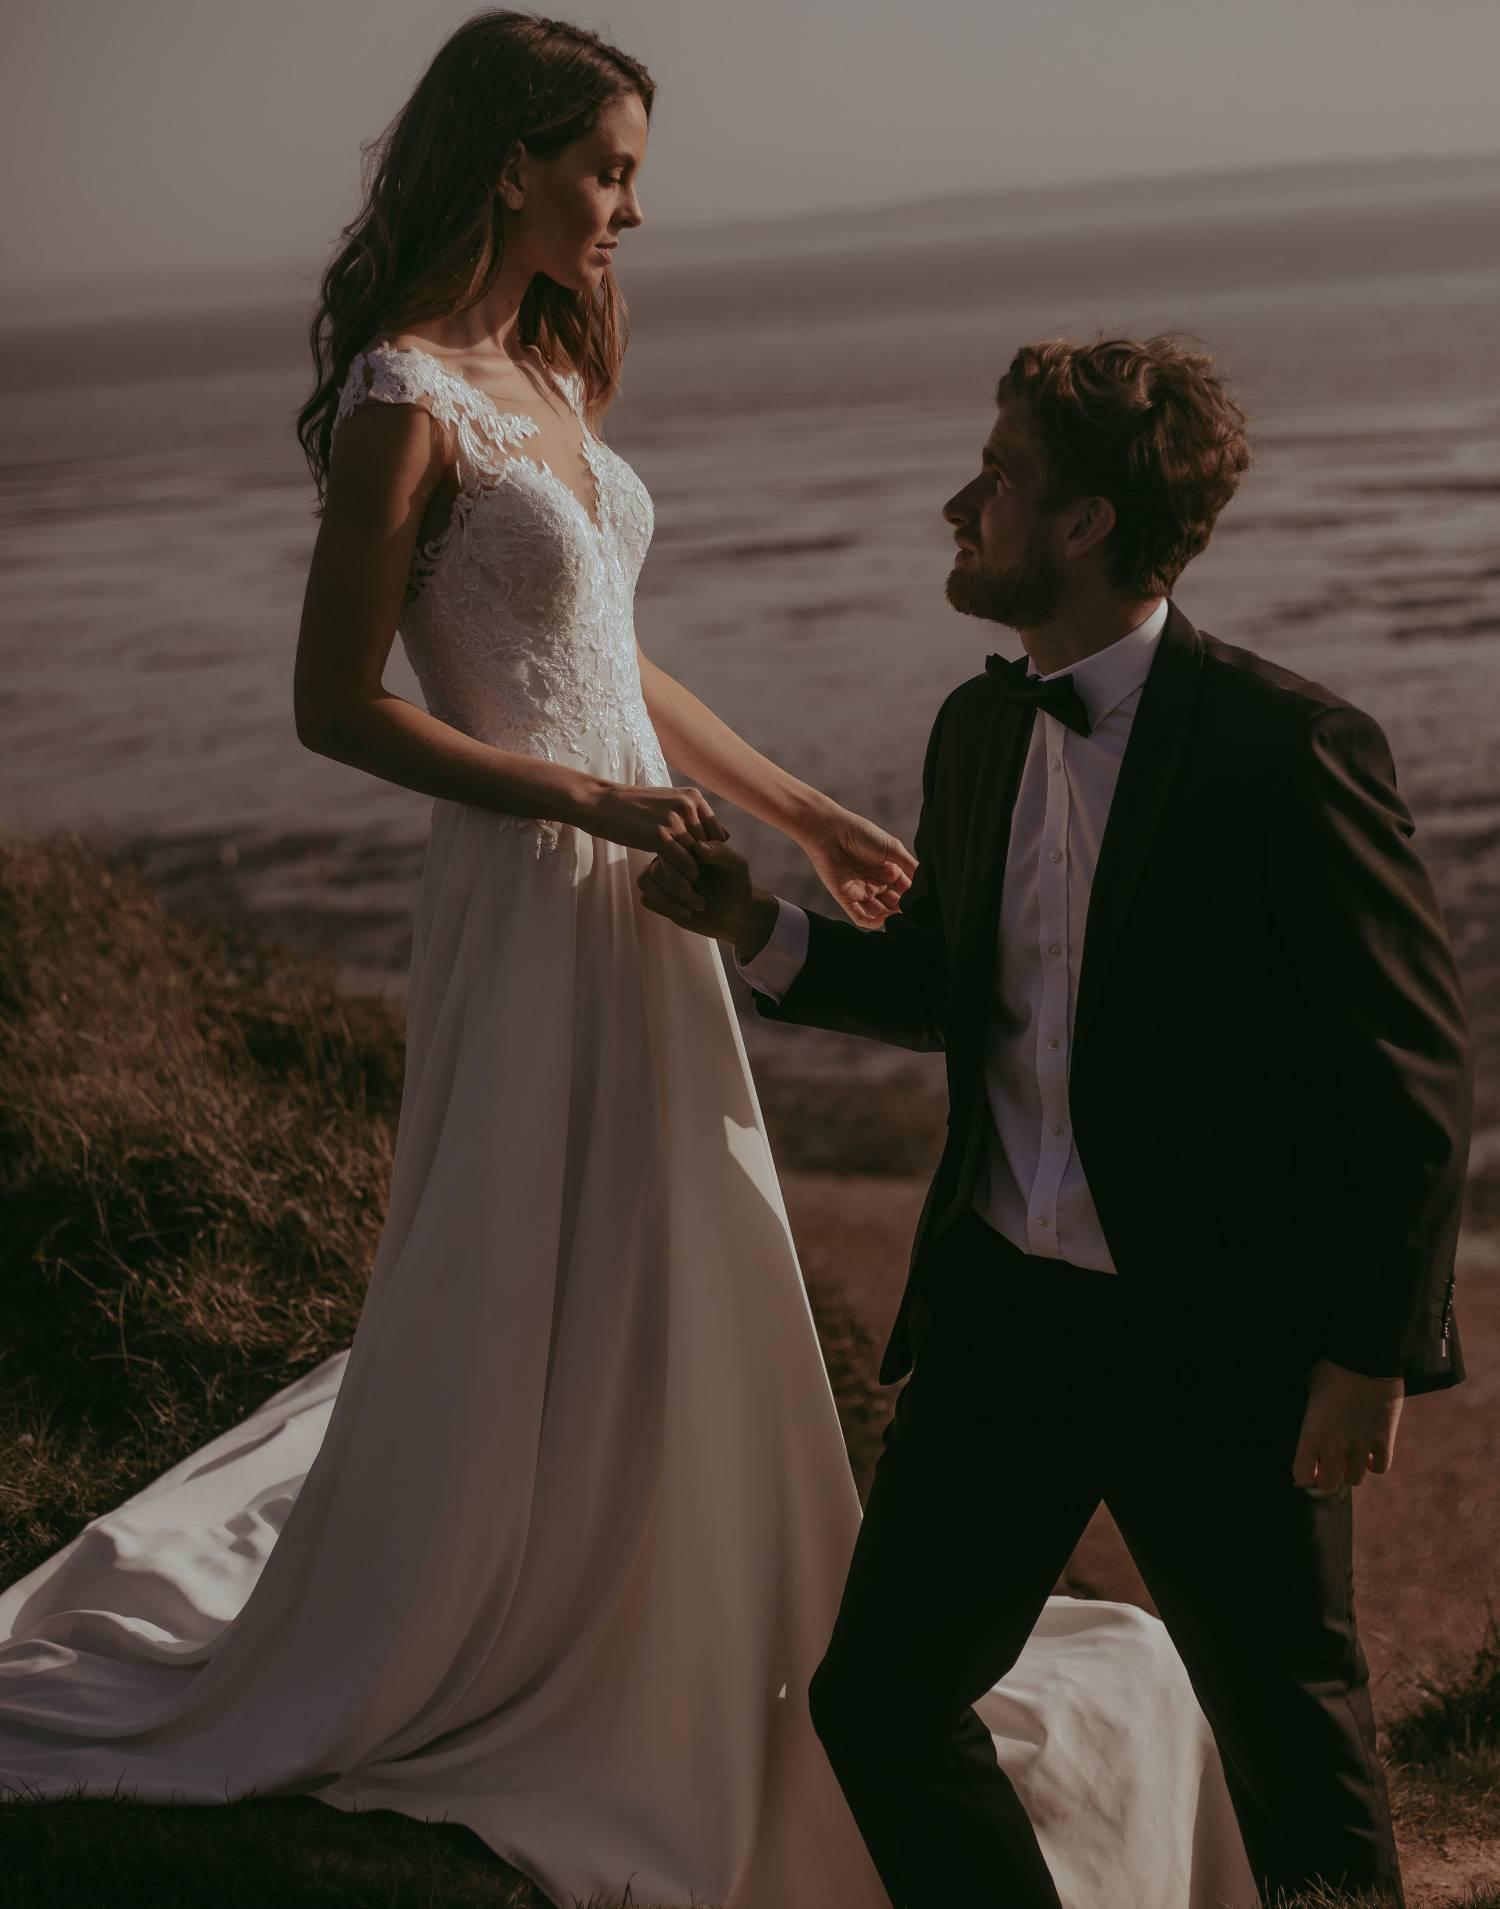 Orebro-wedding-dress-Tiffanys-front-view-min